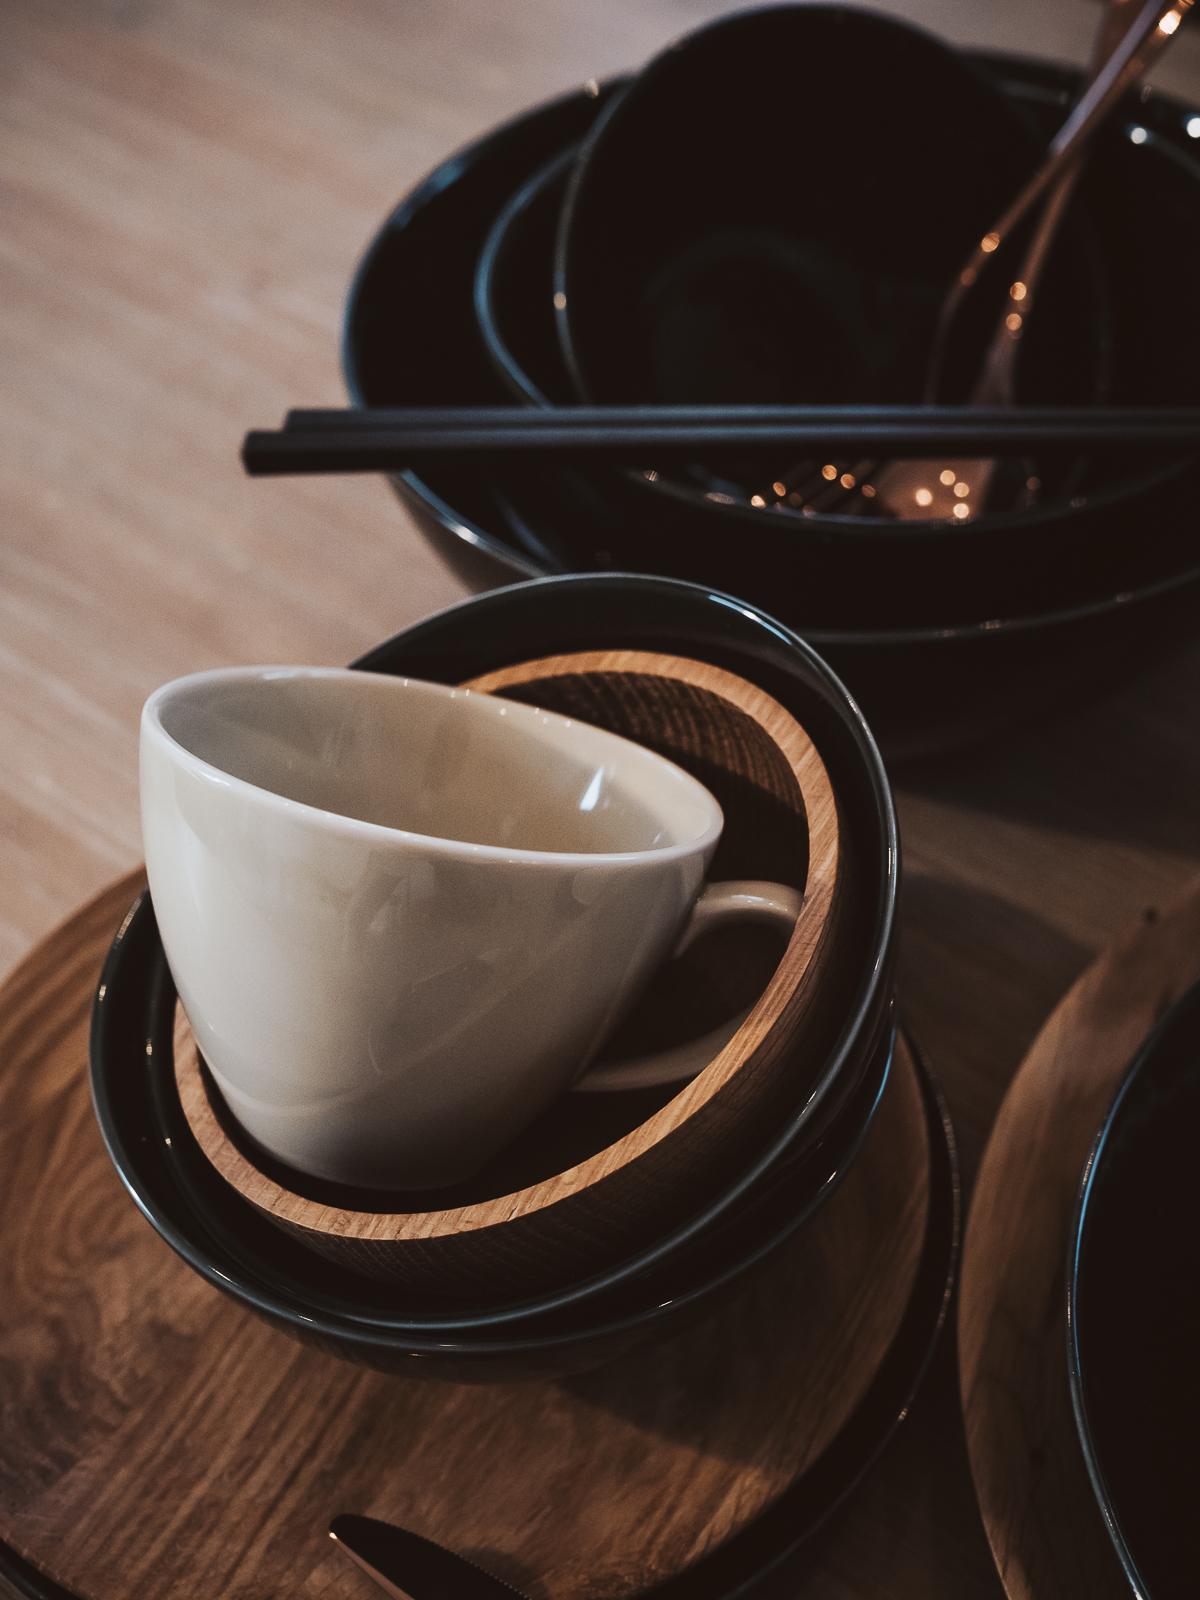 Ingolstadt Village Chinese New Year Lifestyle Shopping & Home Cooking - Olympus EM1Markii 2512 - Yes! Please Enjoy by Fanning Tseng-100.jpg